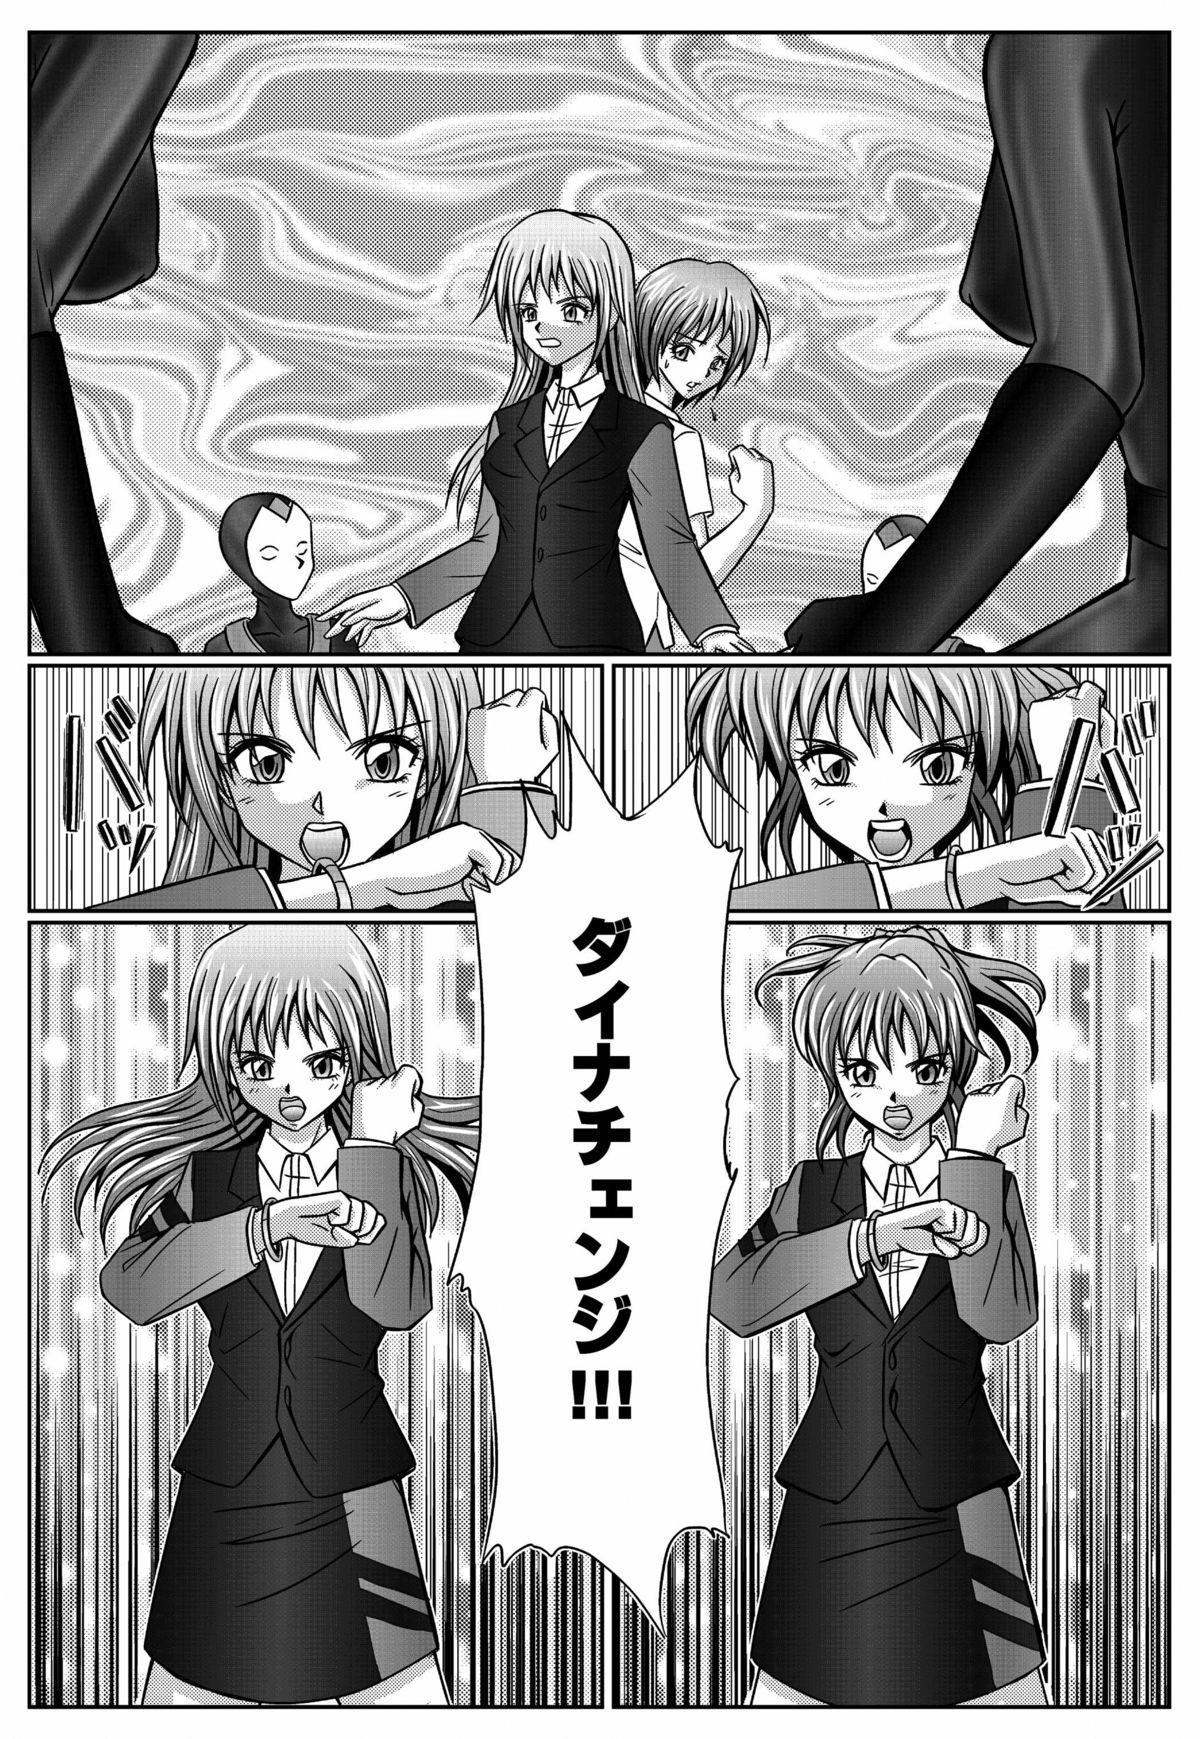 [Macxe's (monmon)] Tokubousentai Dinaranger ~Heroine Kairaku Sennou Keikaku~ Vol.01/02/03 (Renkaban) [Digital] 136